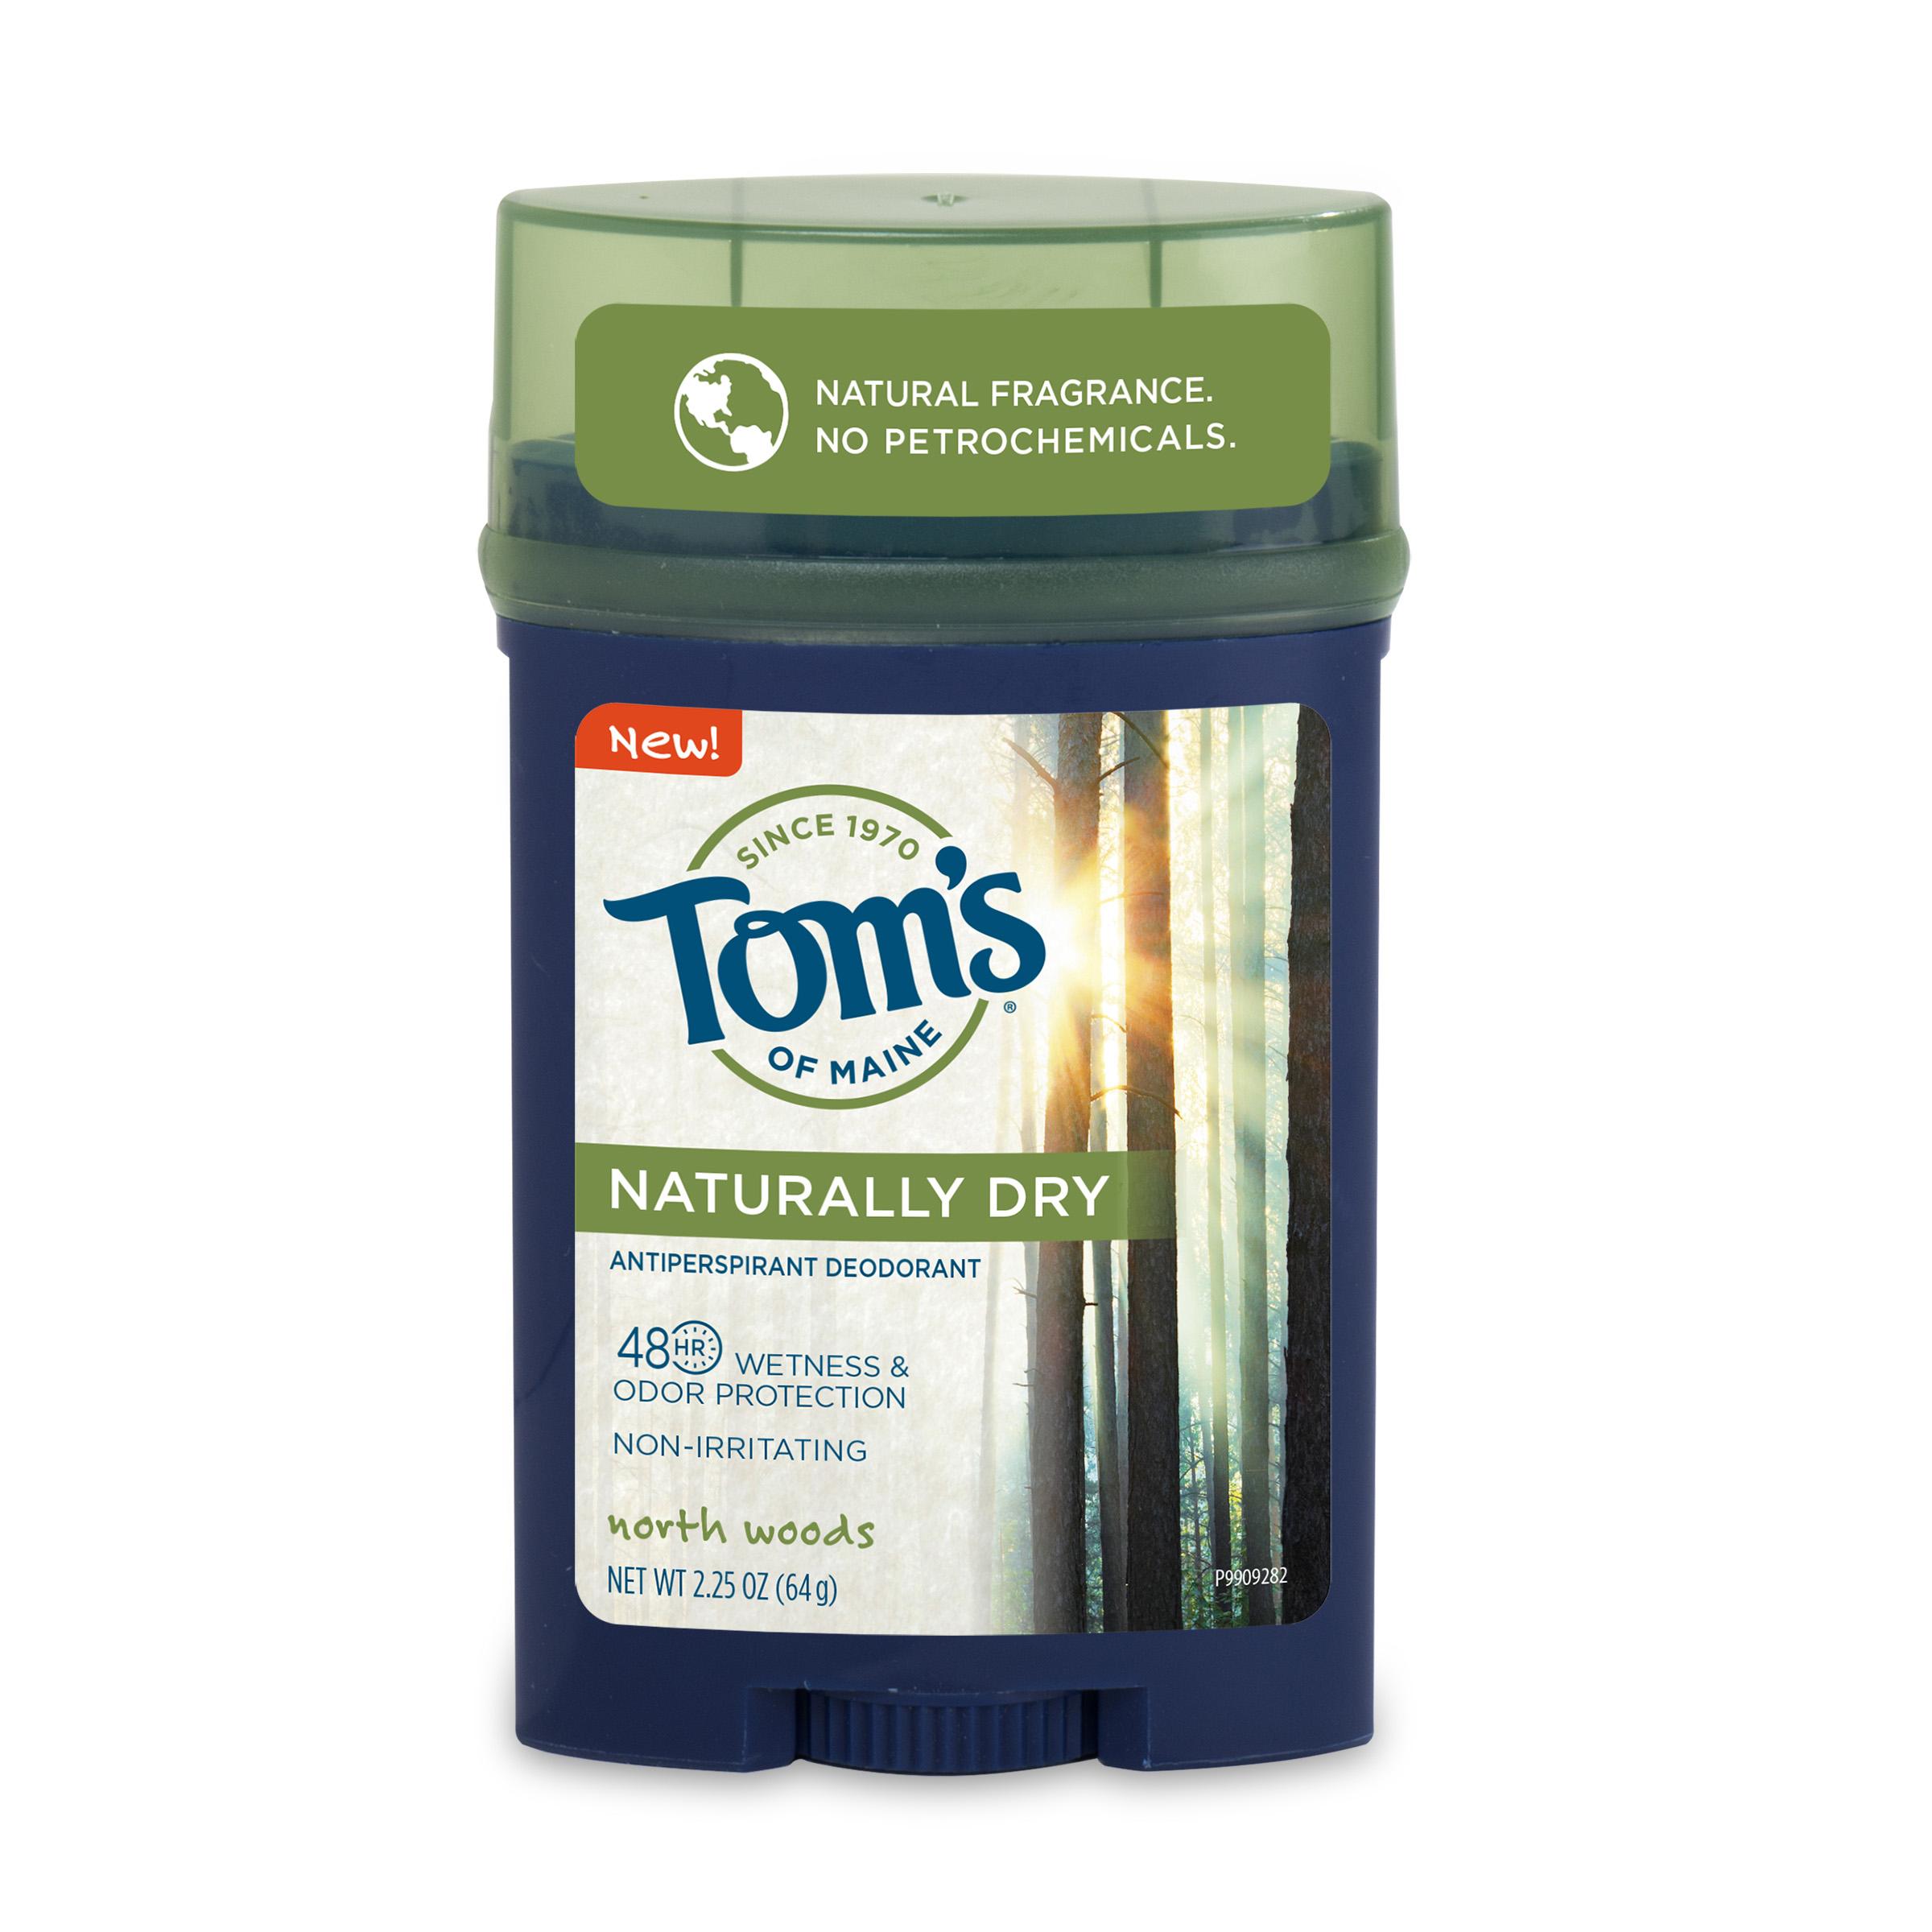 Men's Naturally Dry North Woods Antiperspirant